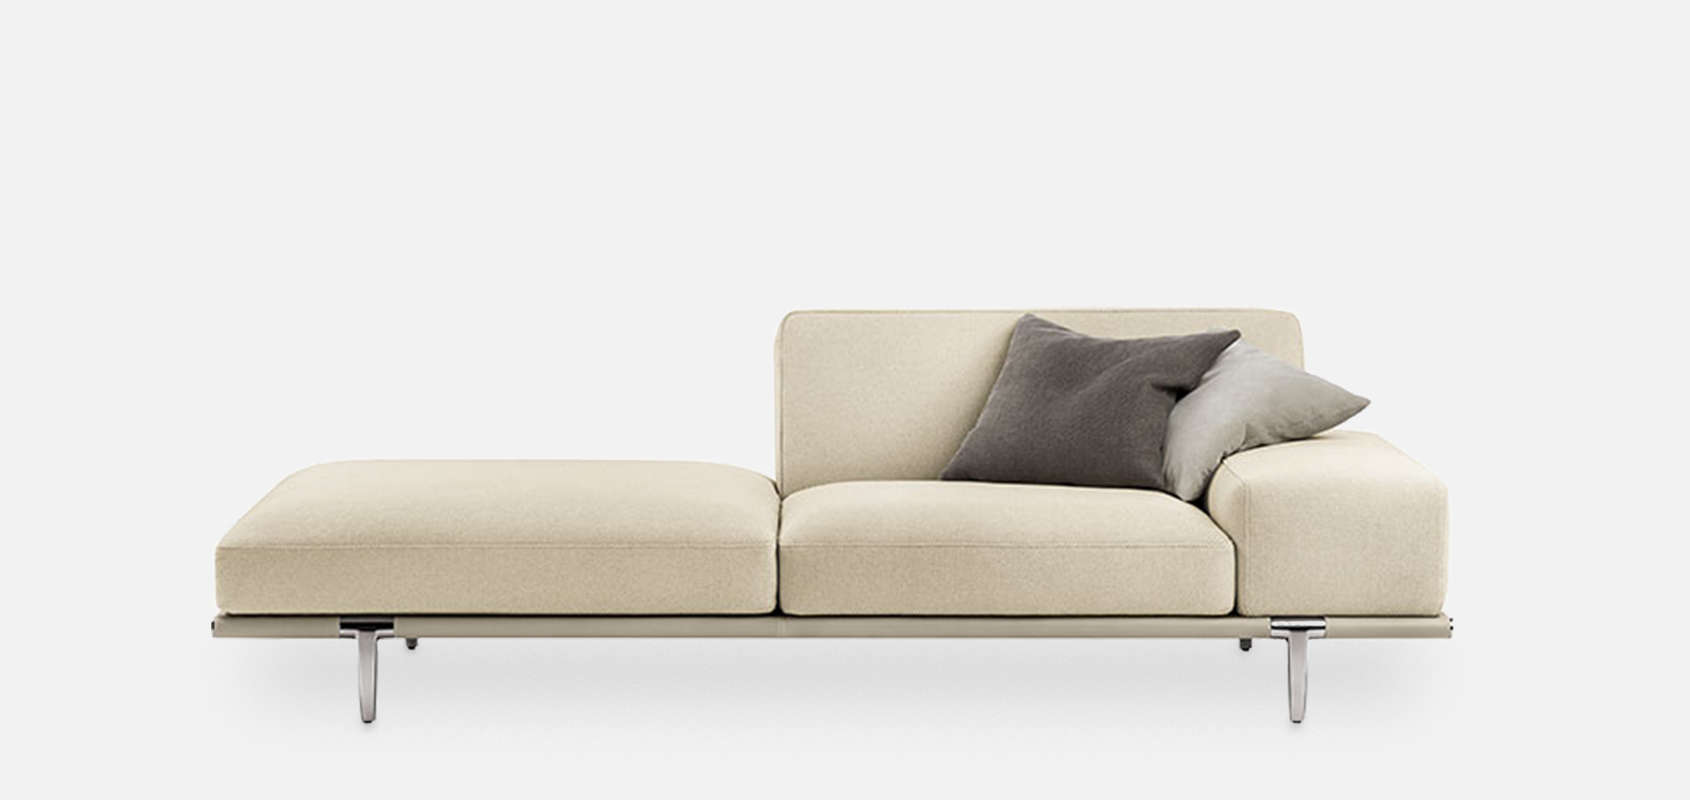 Poltrona Studio.Let It Be Sofa By Ludovica Roberto Palomba For Poltrona Frau